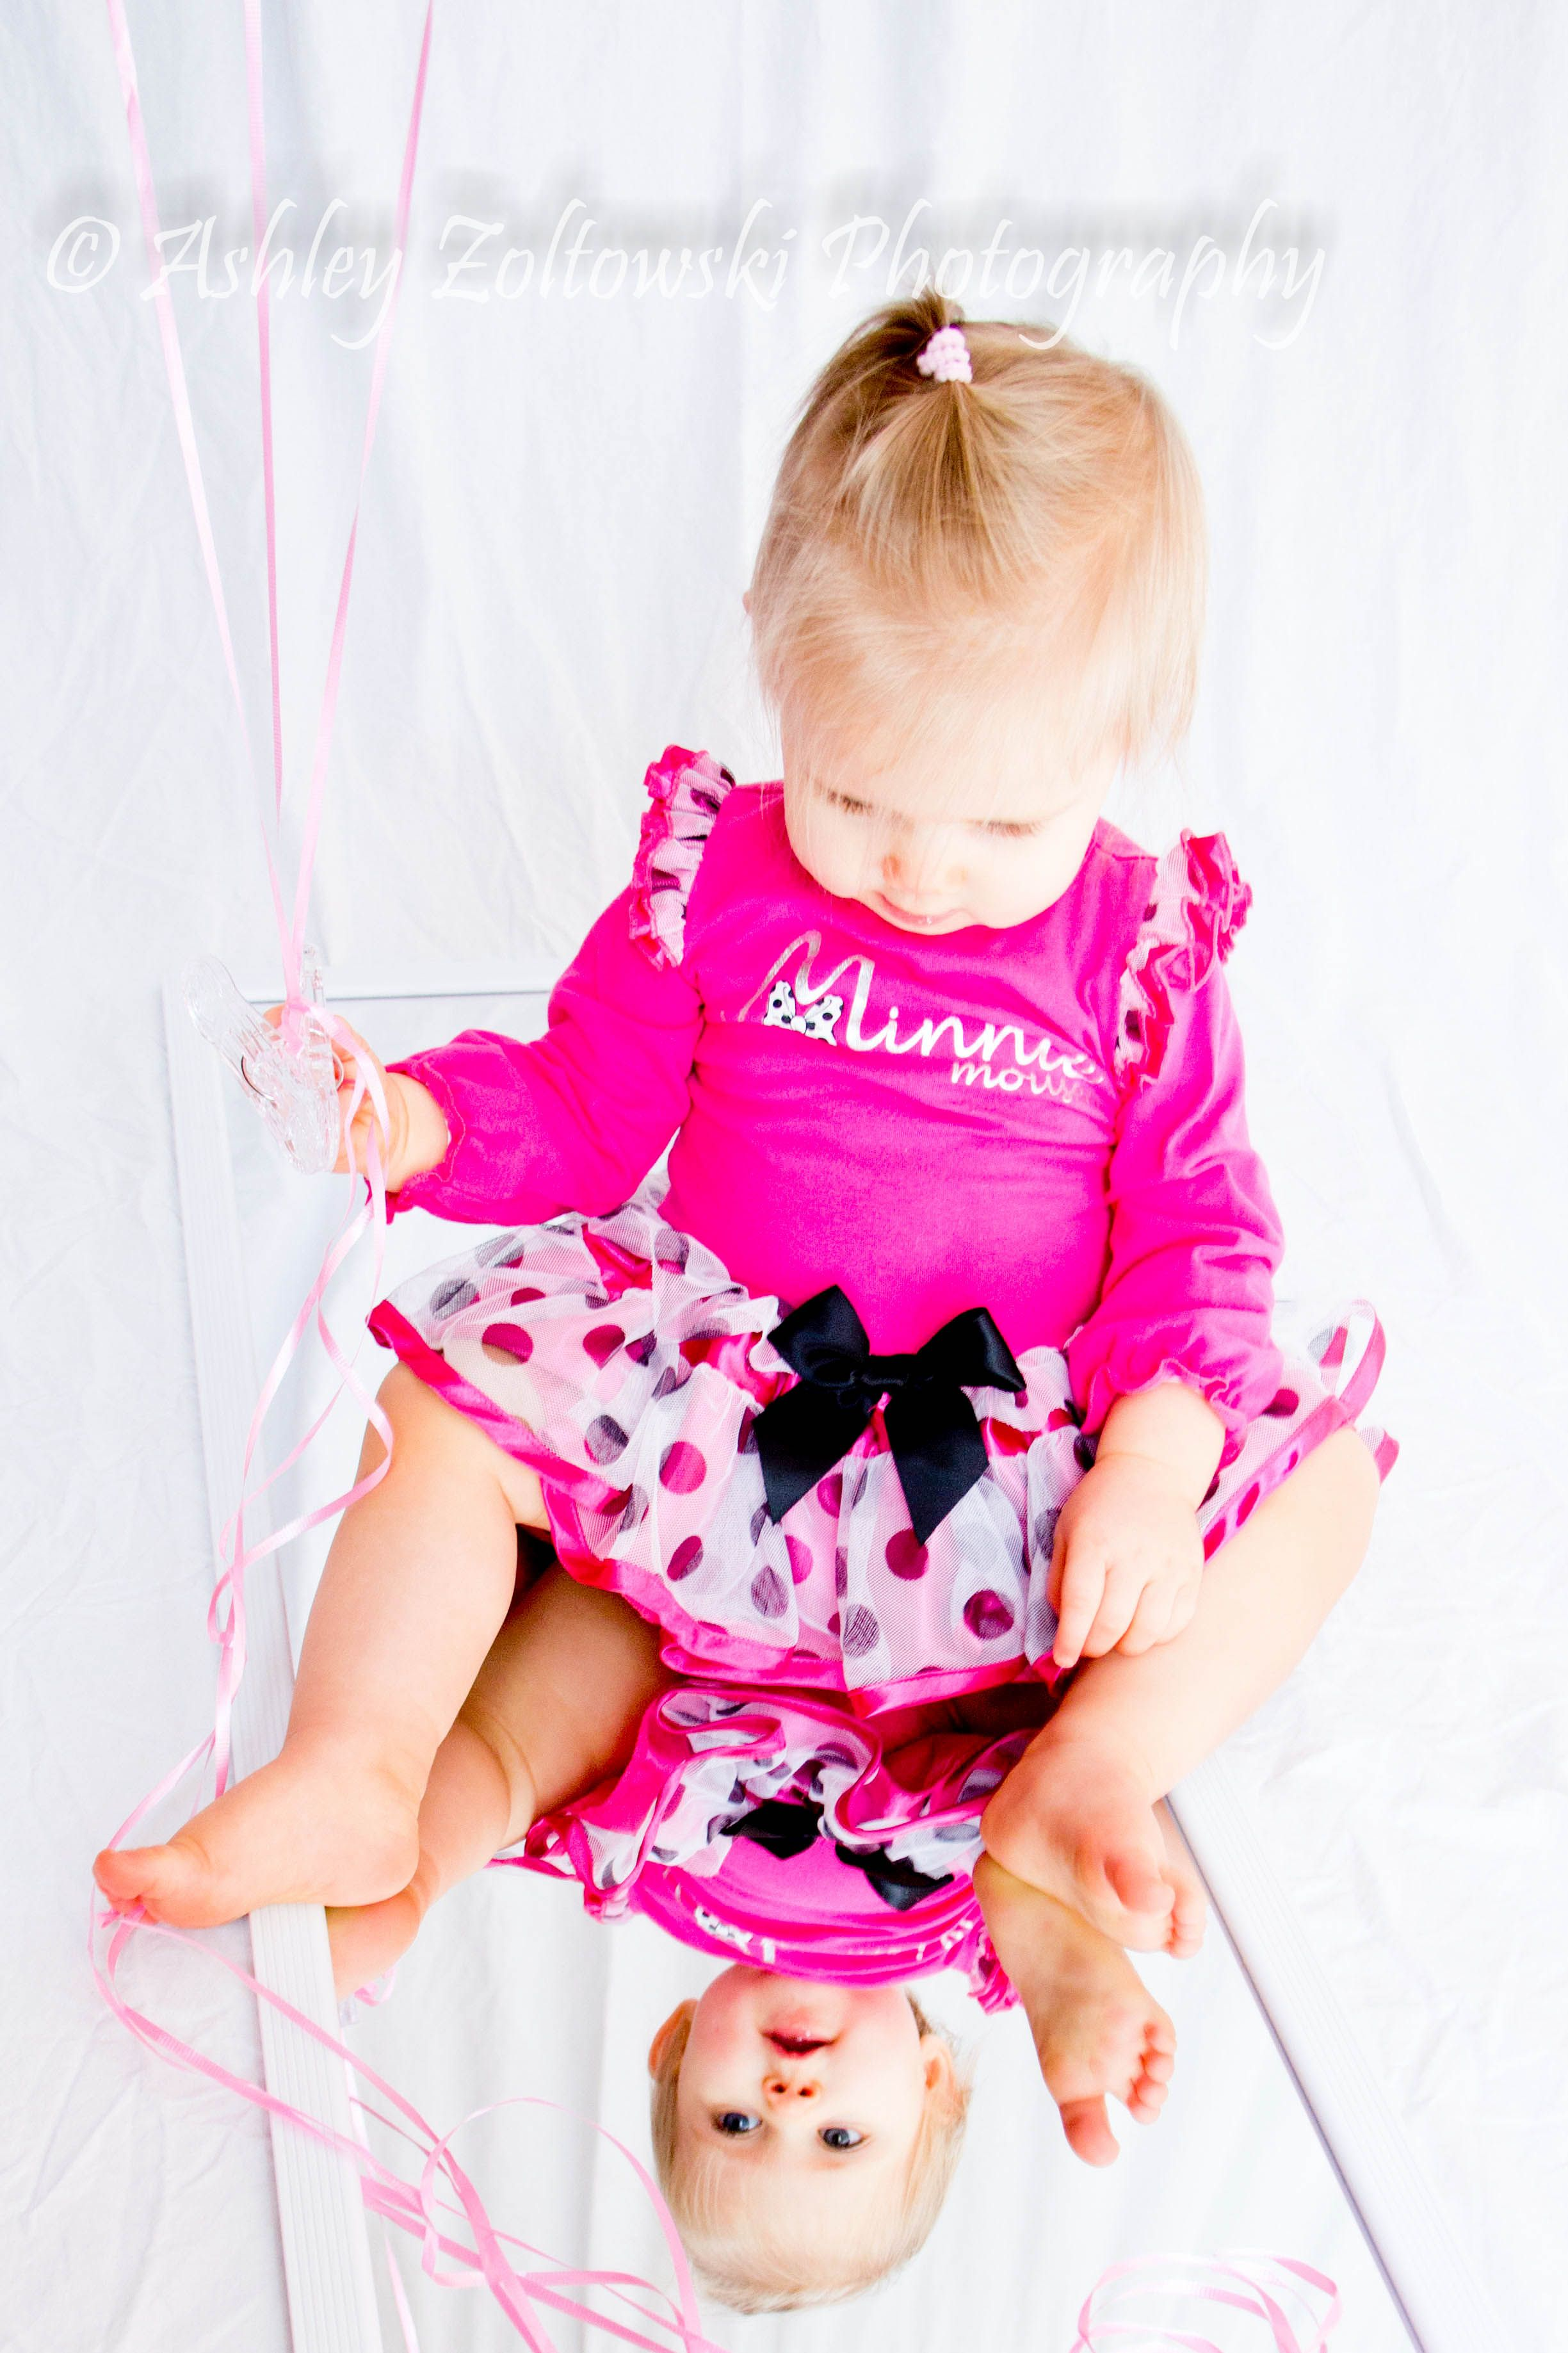 Beautiful Reflection 1 year old Happy Birthday